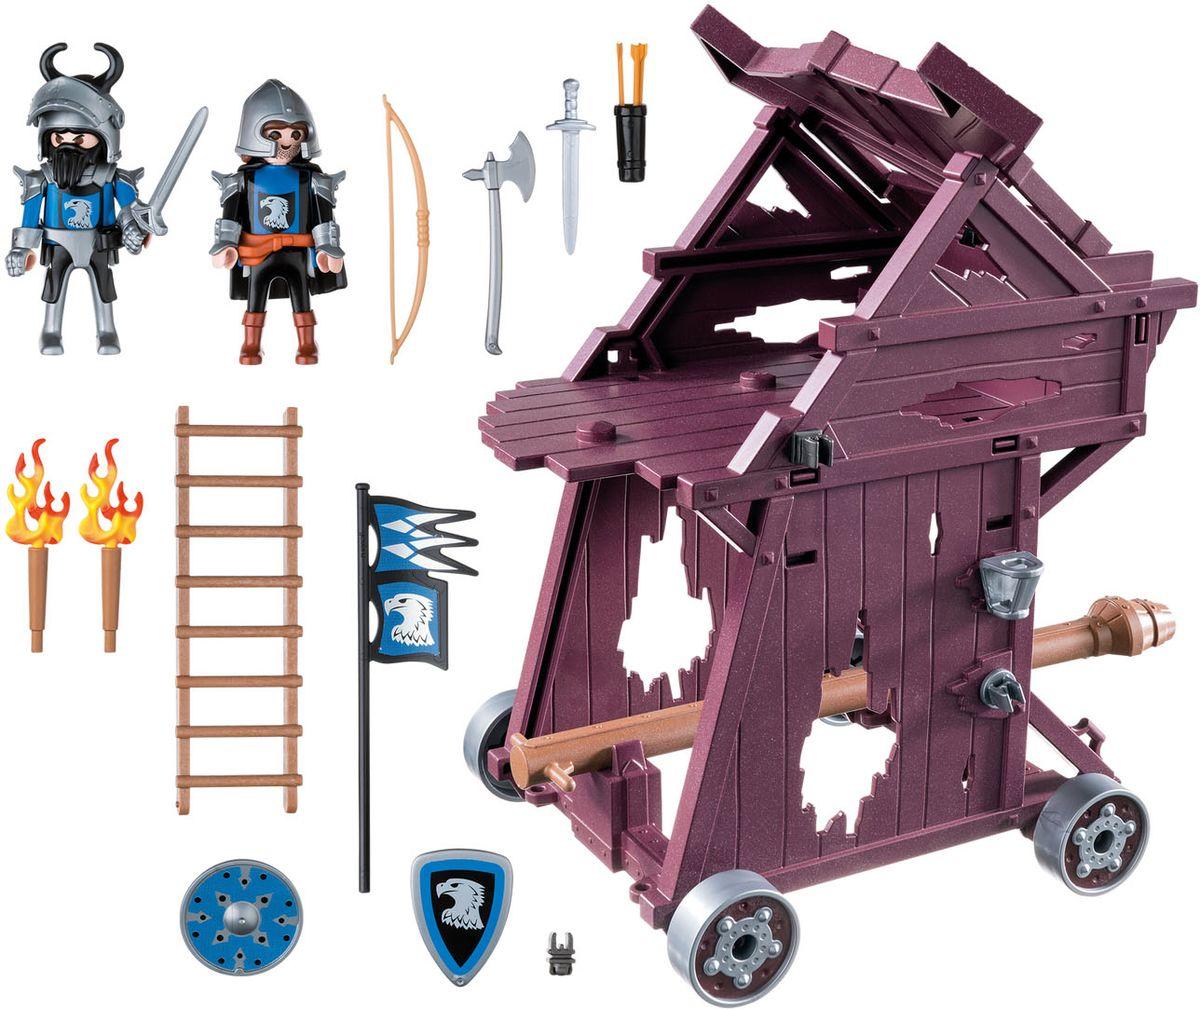 Playmobil Игровой набор Рыцари Орла атакуют башню